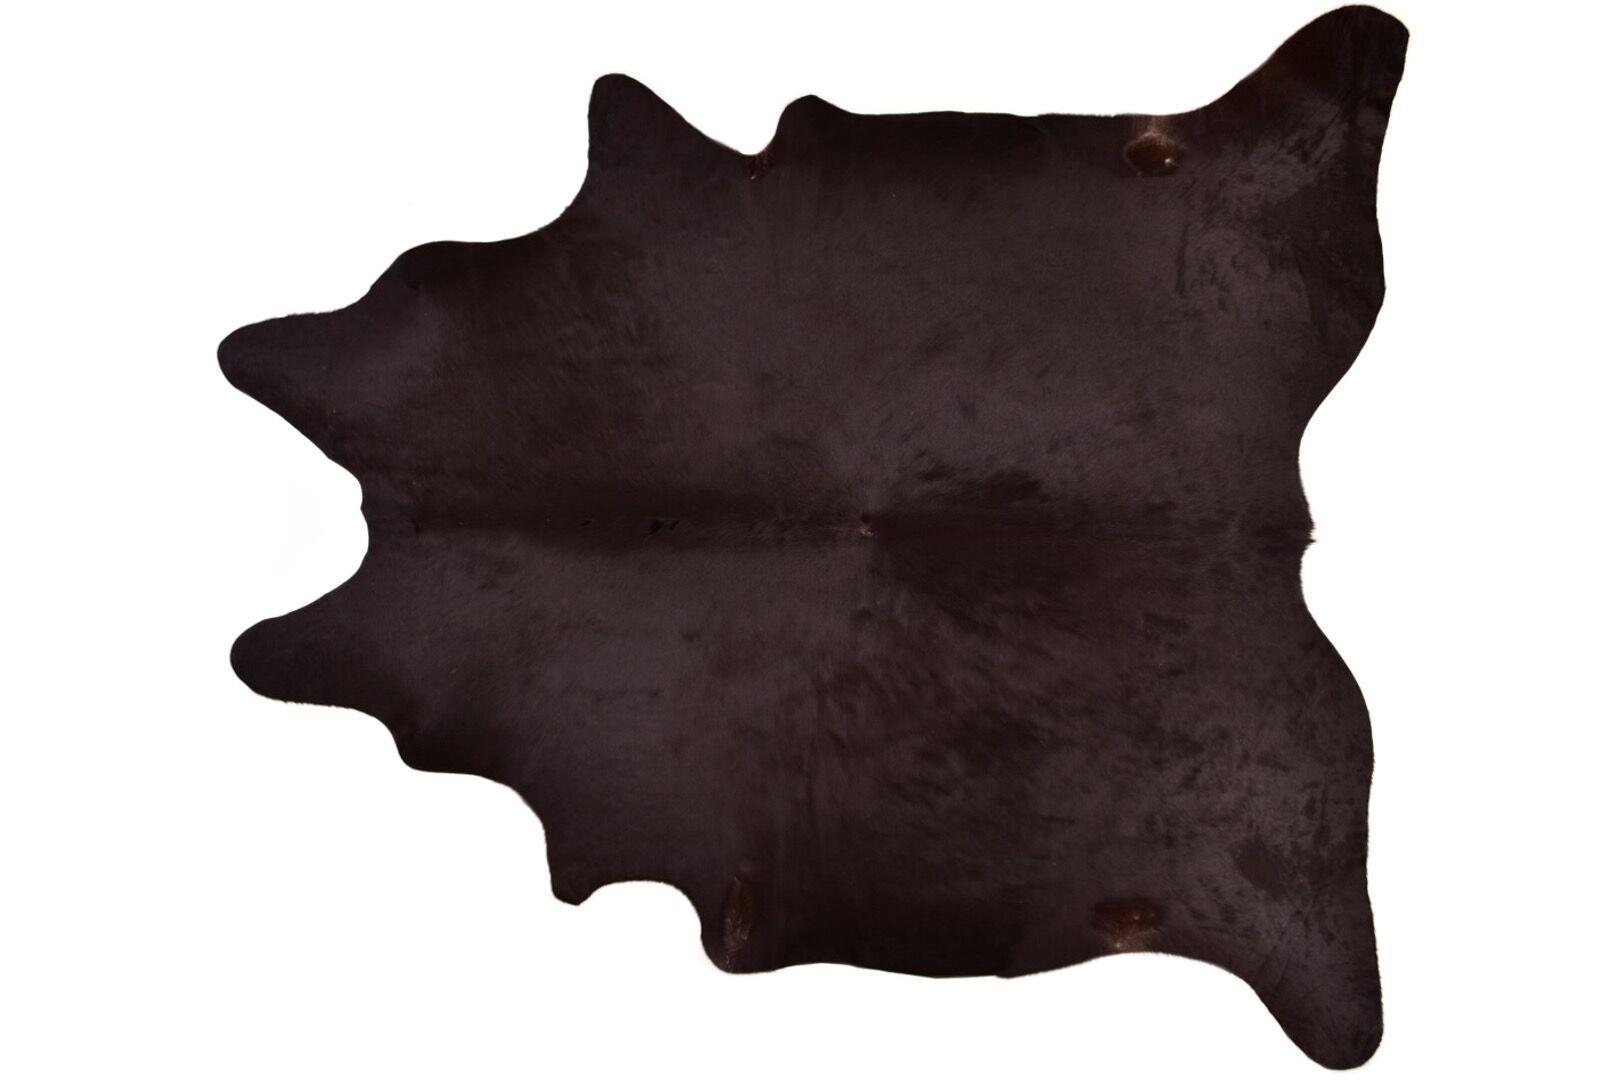 Askew Hand-Woven Cowhide Brown Area Rug